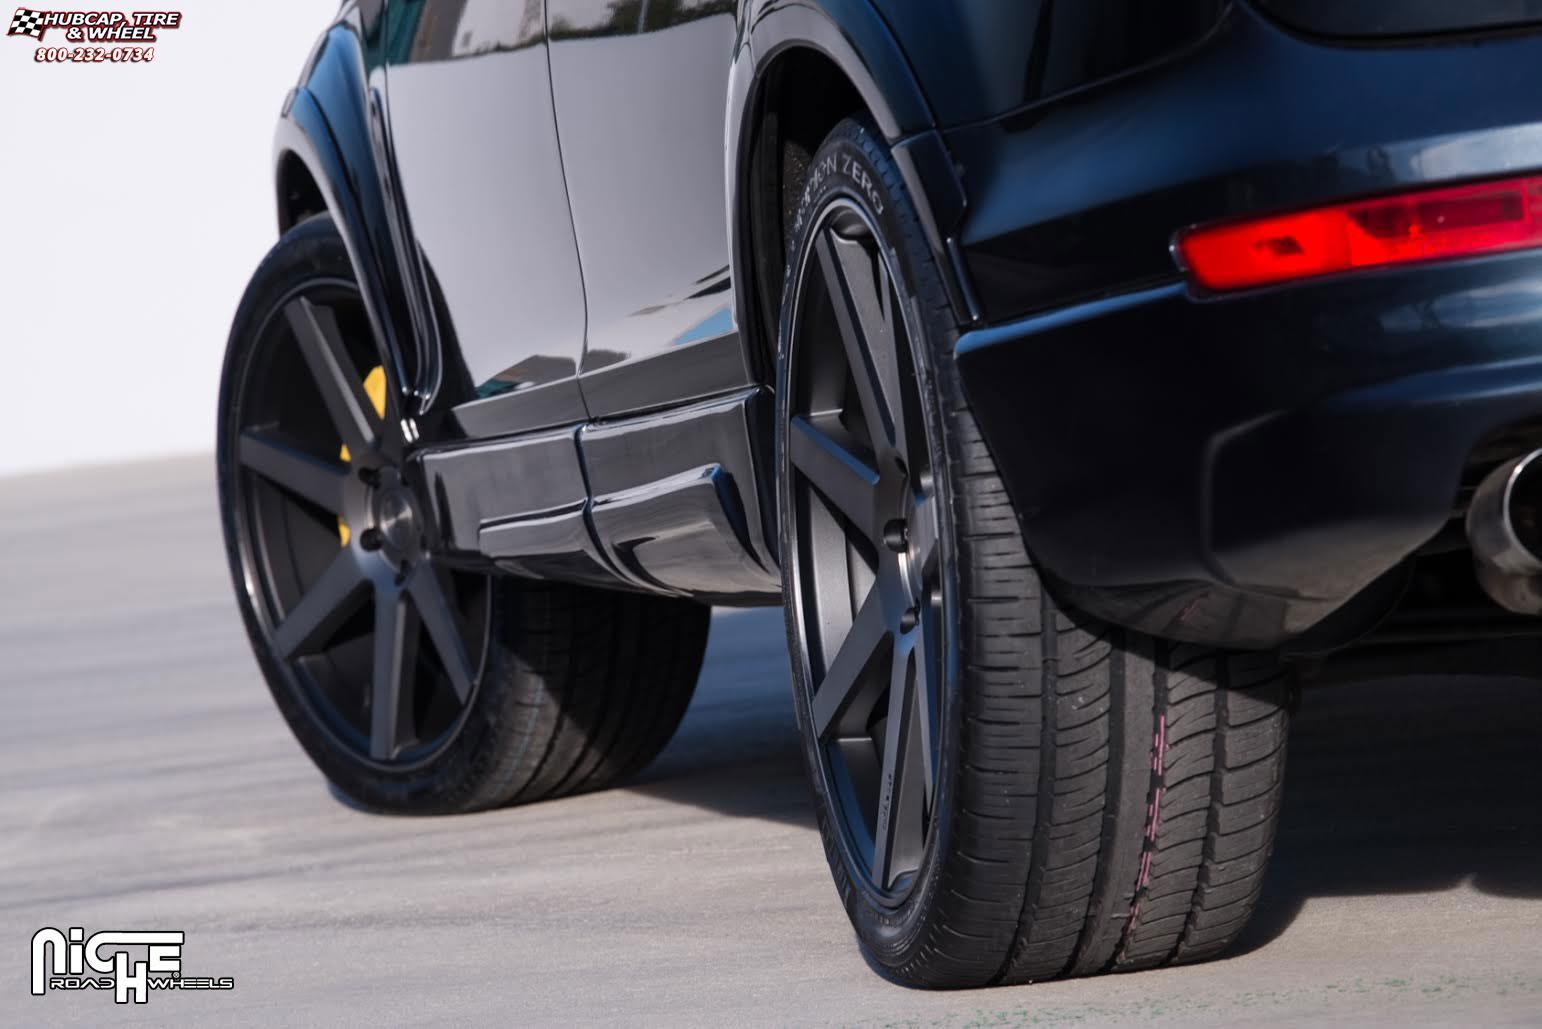 Audi Q7 Niche Verona M150 Wheels Black Amp Machined With